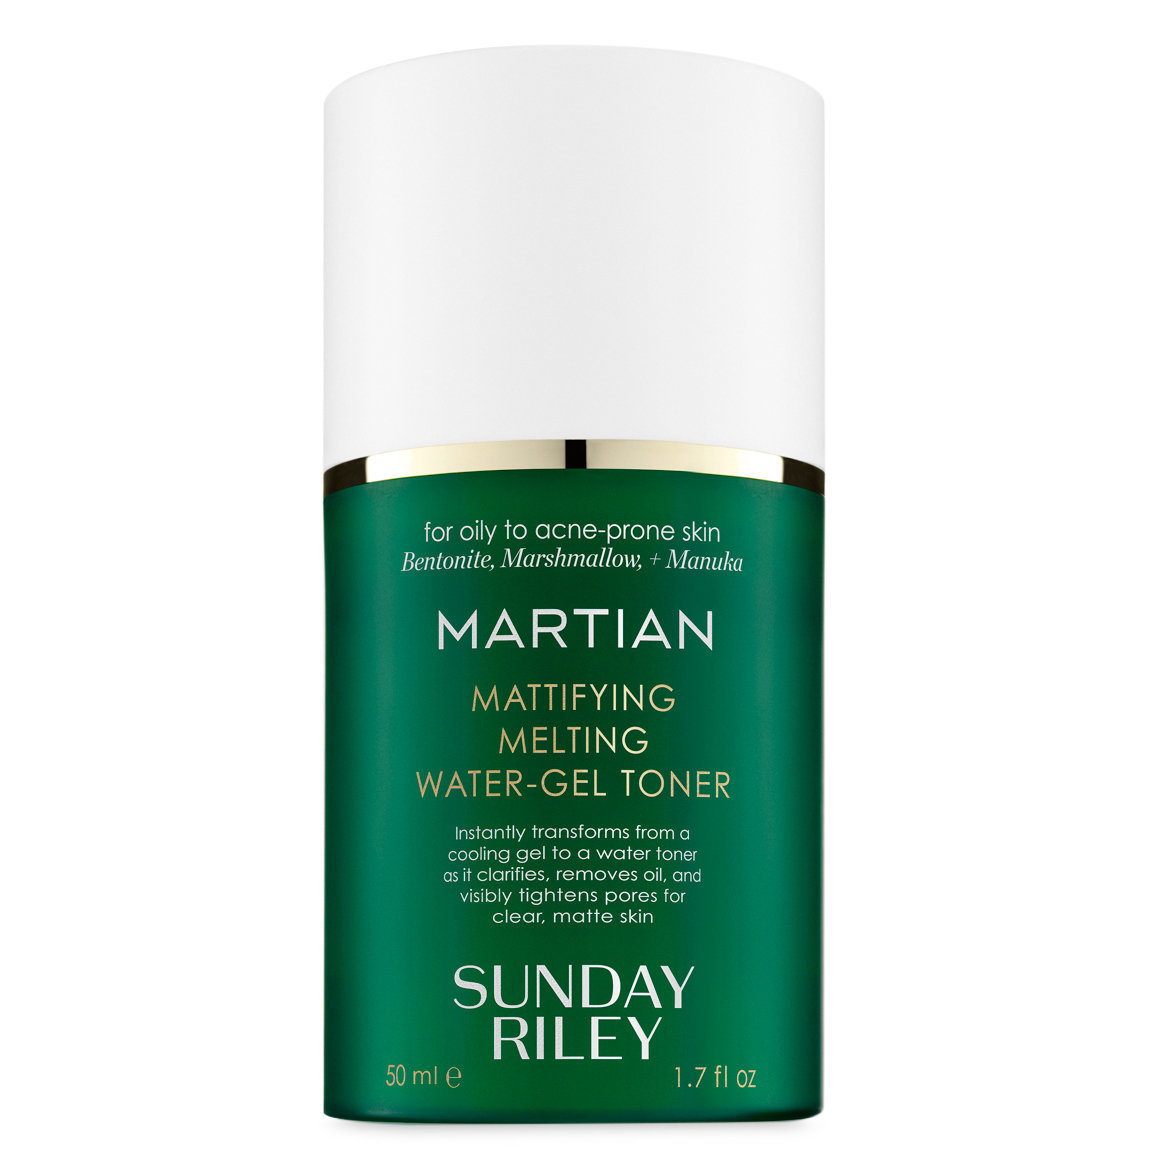 Sunday Riley Martian Mattifying Melting Water-Gel Toner 50 ml alternative view 1 - product swatch.